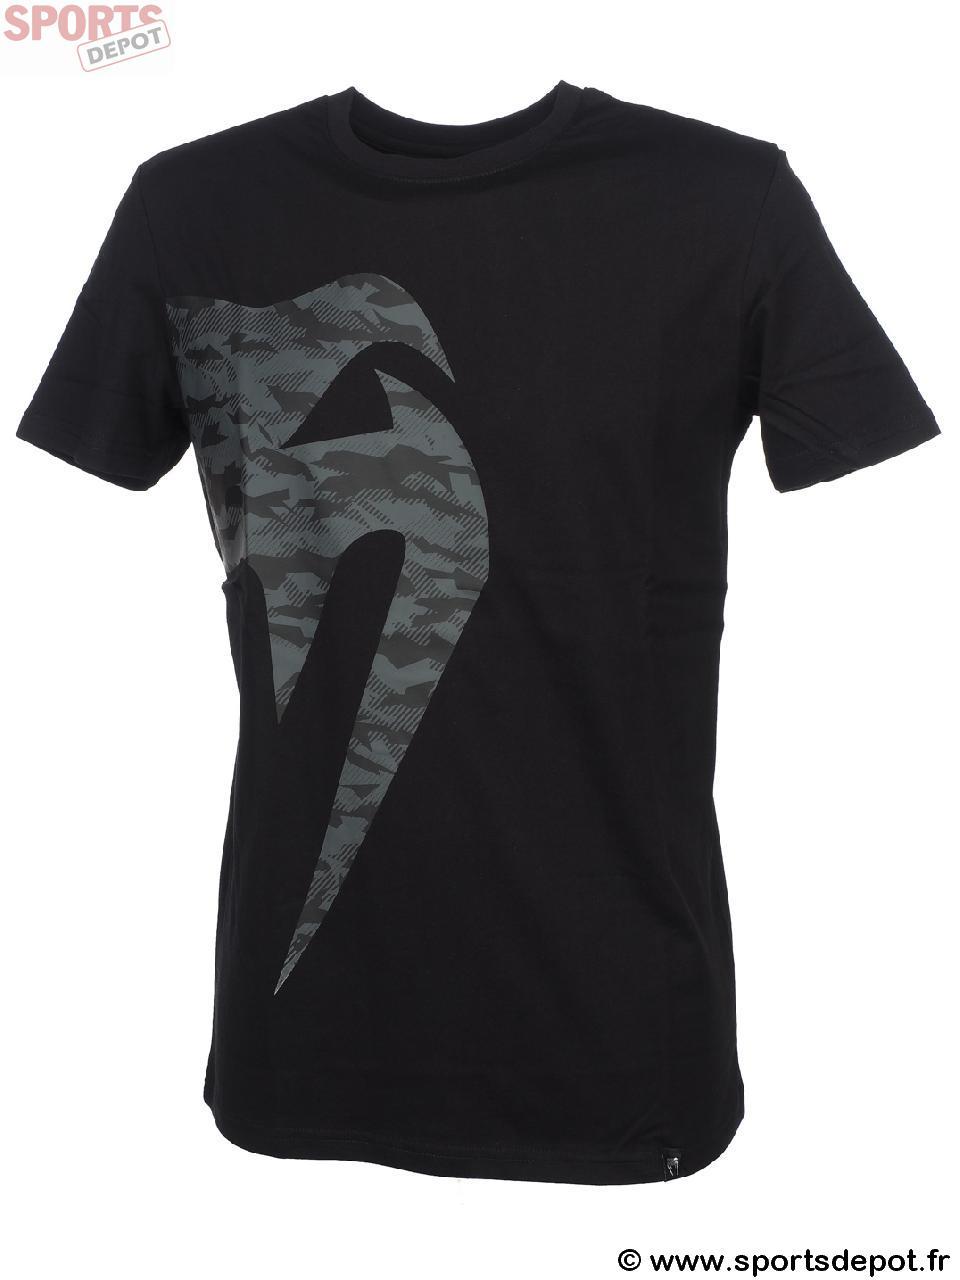 ff71c6c095d7d Acheter Tee shirt manches courtes VENUM Giant camo mc tee - Homme ...